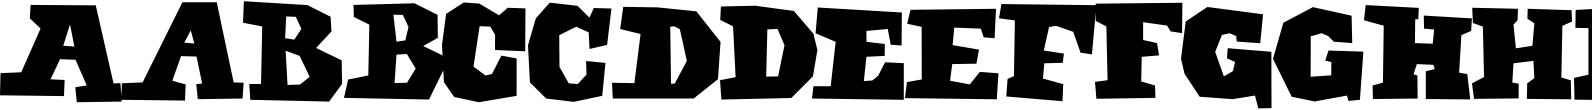 Display Black Serif